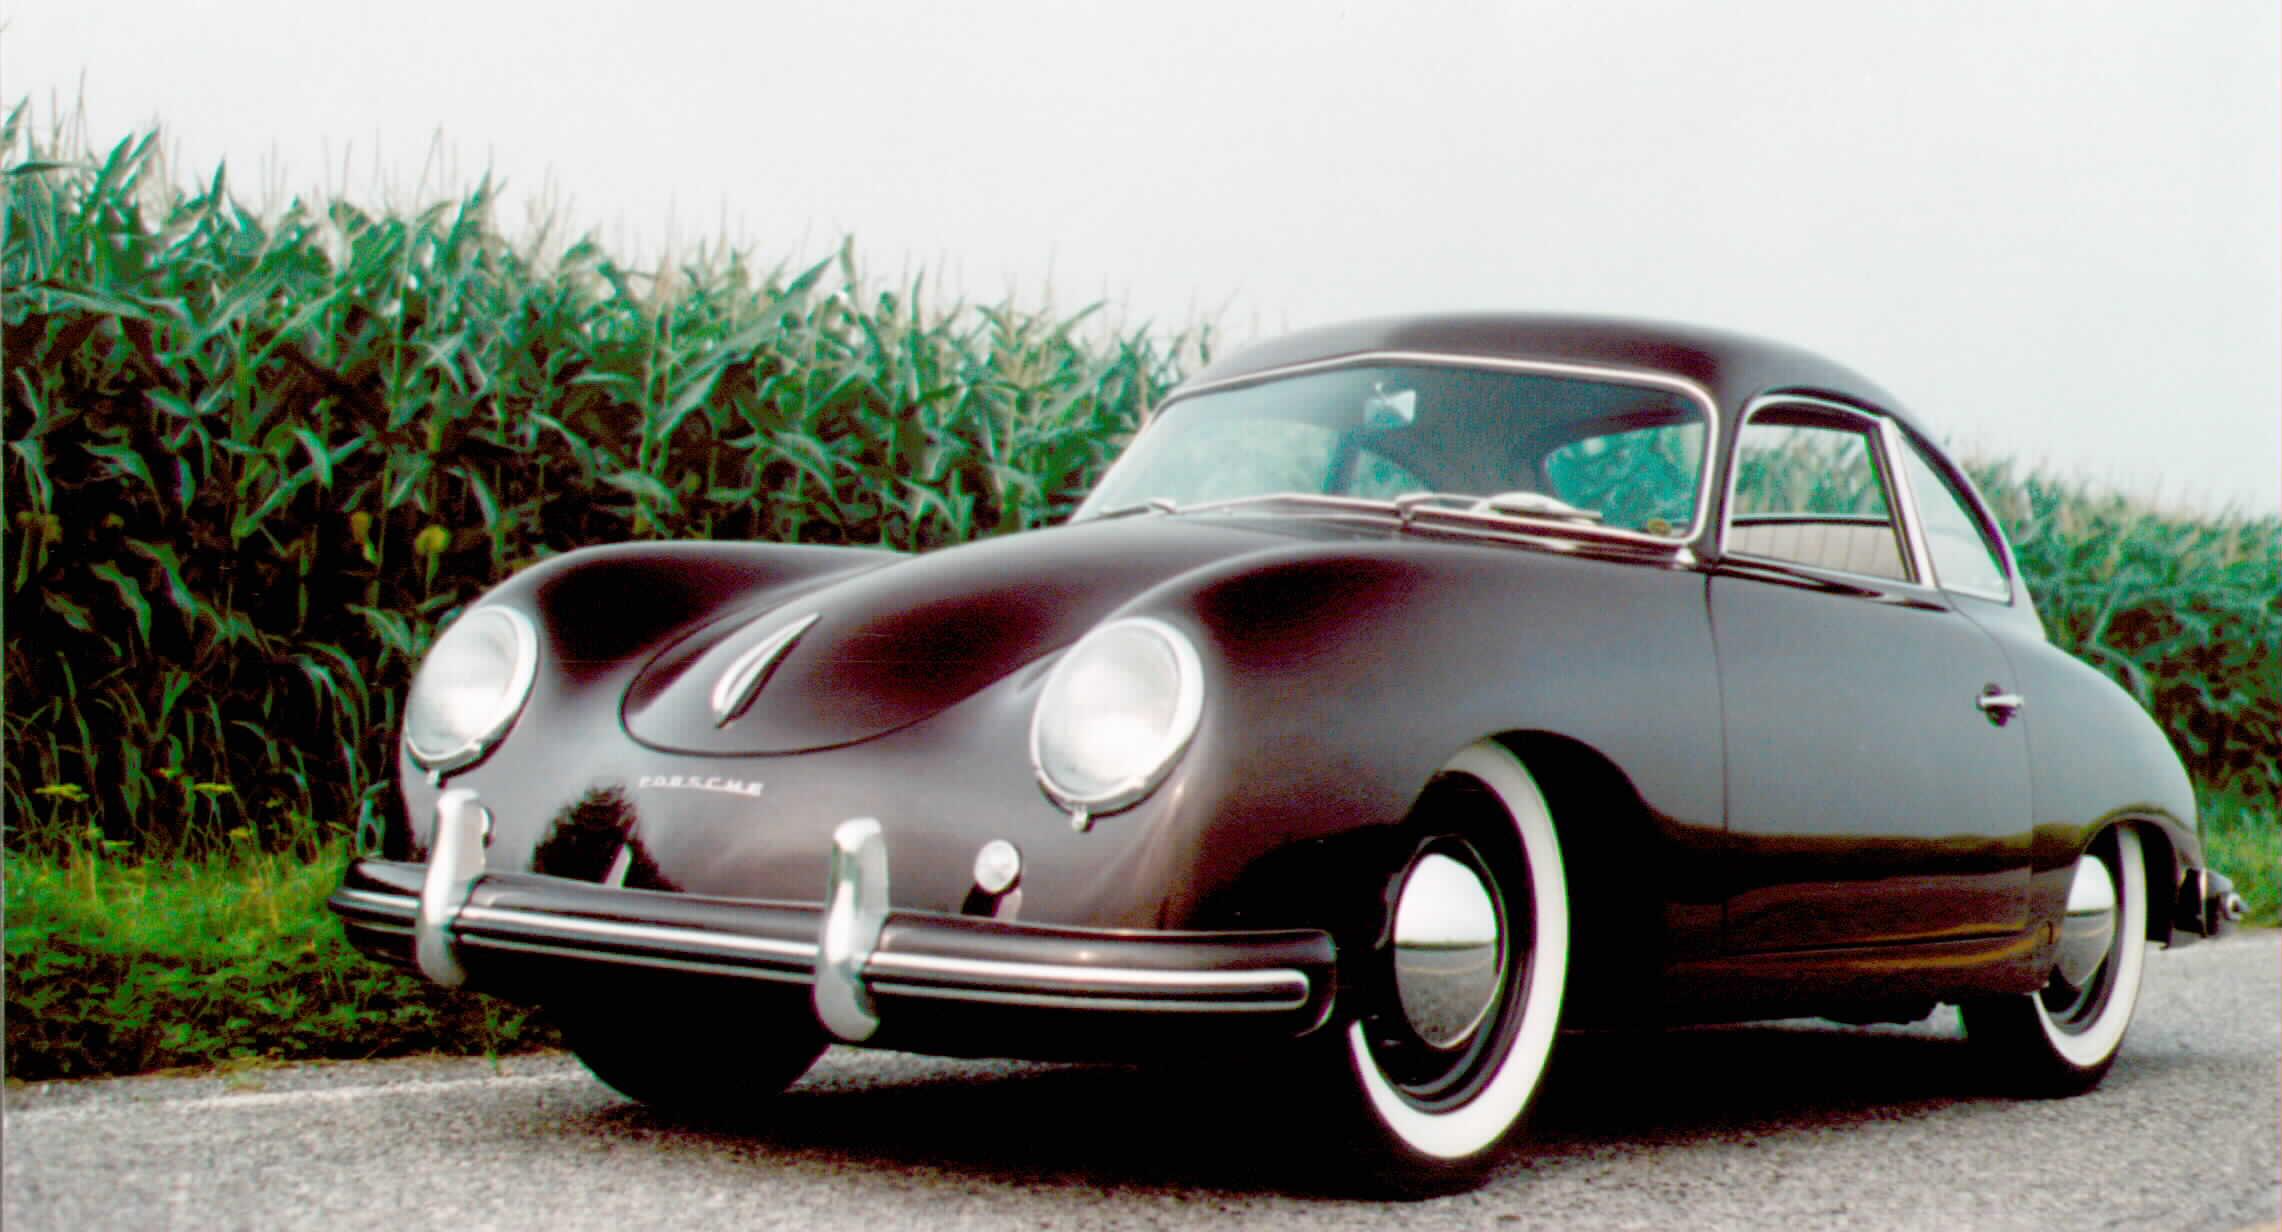 Porsche 356 Full Hd Wallpaper And Background 2282x1232